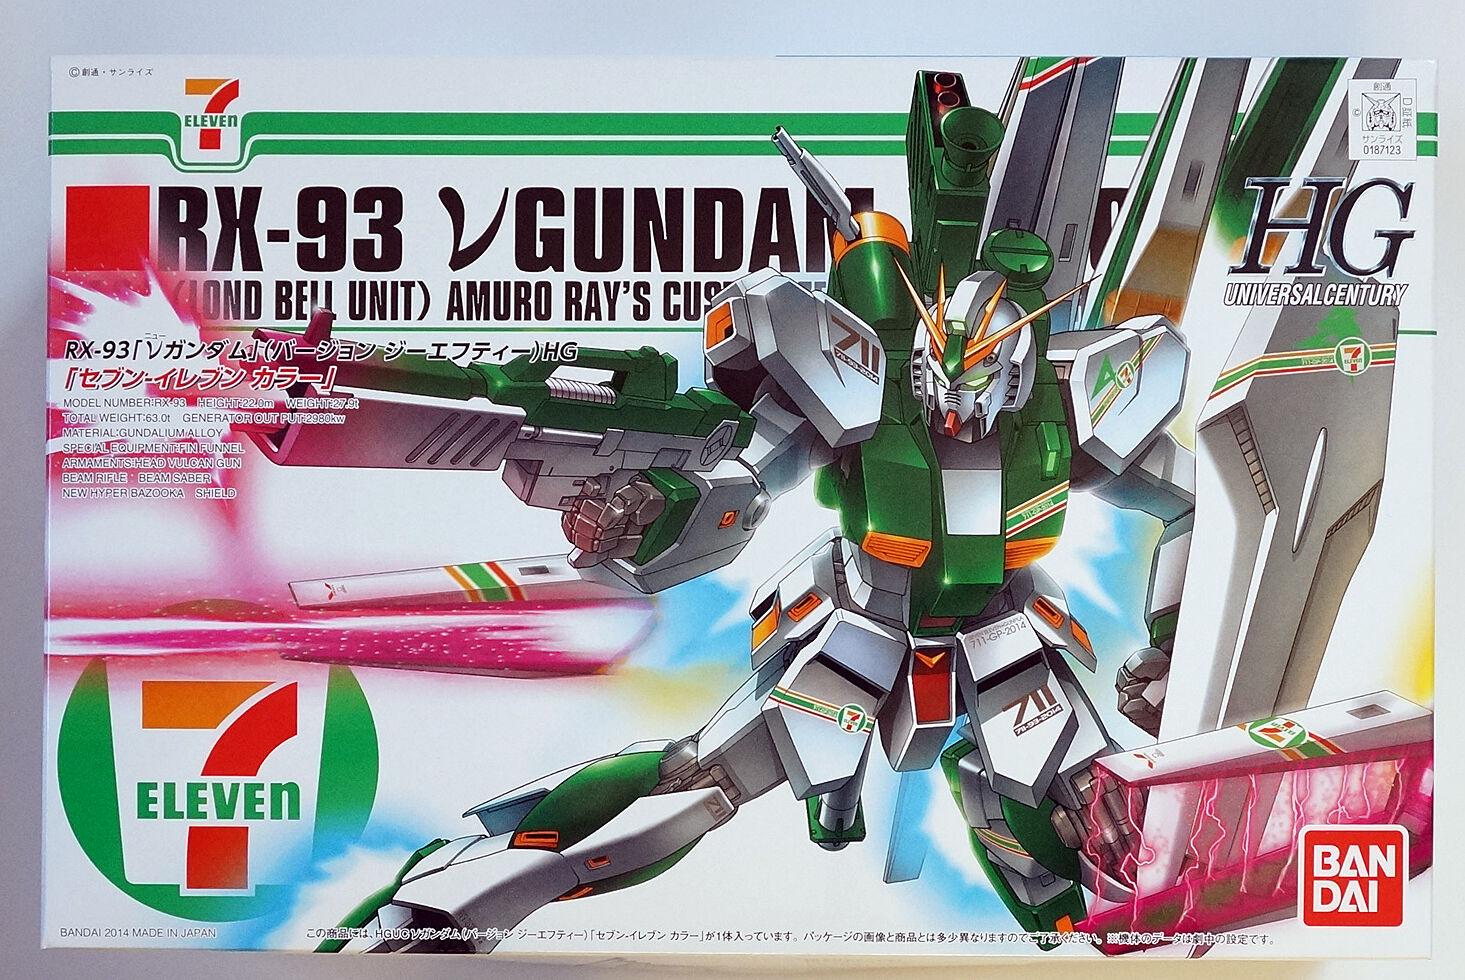 BANDAI HGUC 1 144 ν (Nu) GUNDAM ver GFT 7-Eleven color limited scale model kit